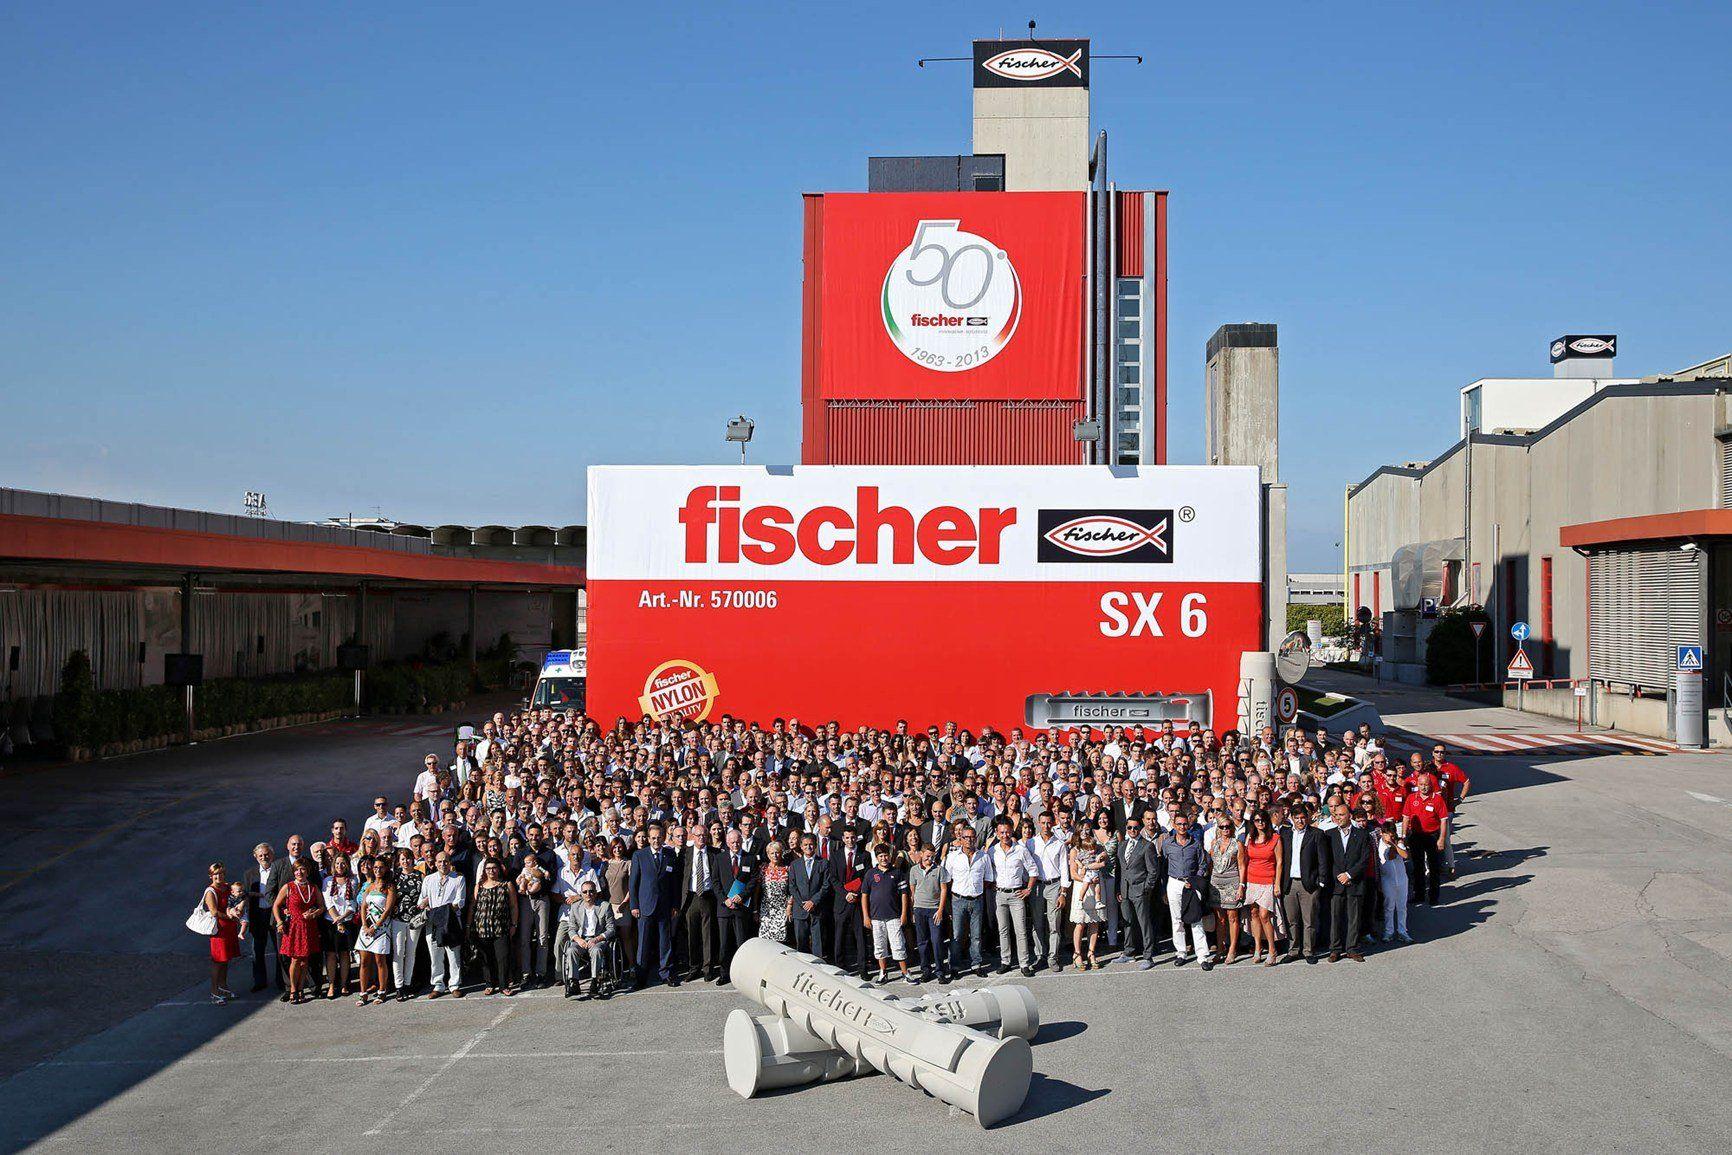 fischer Italia: cinquant'anni di successi